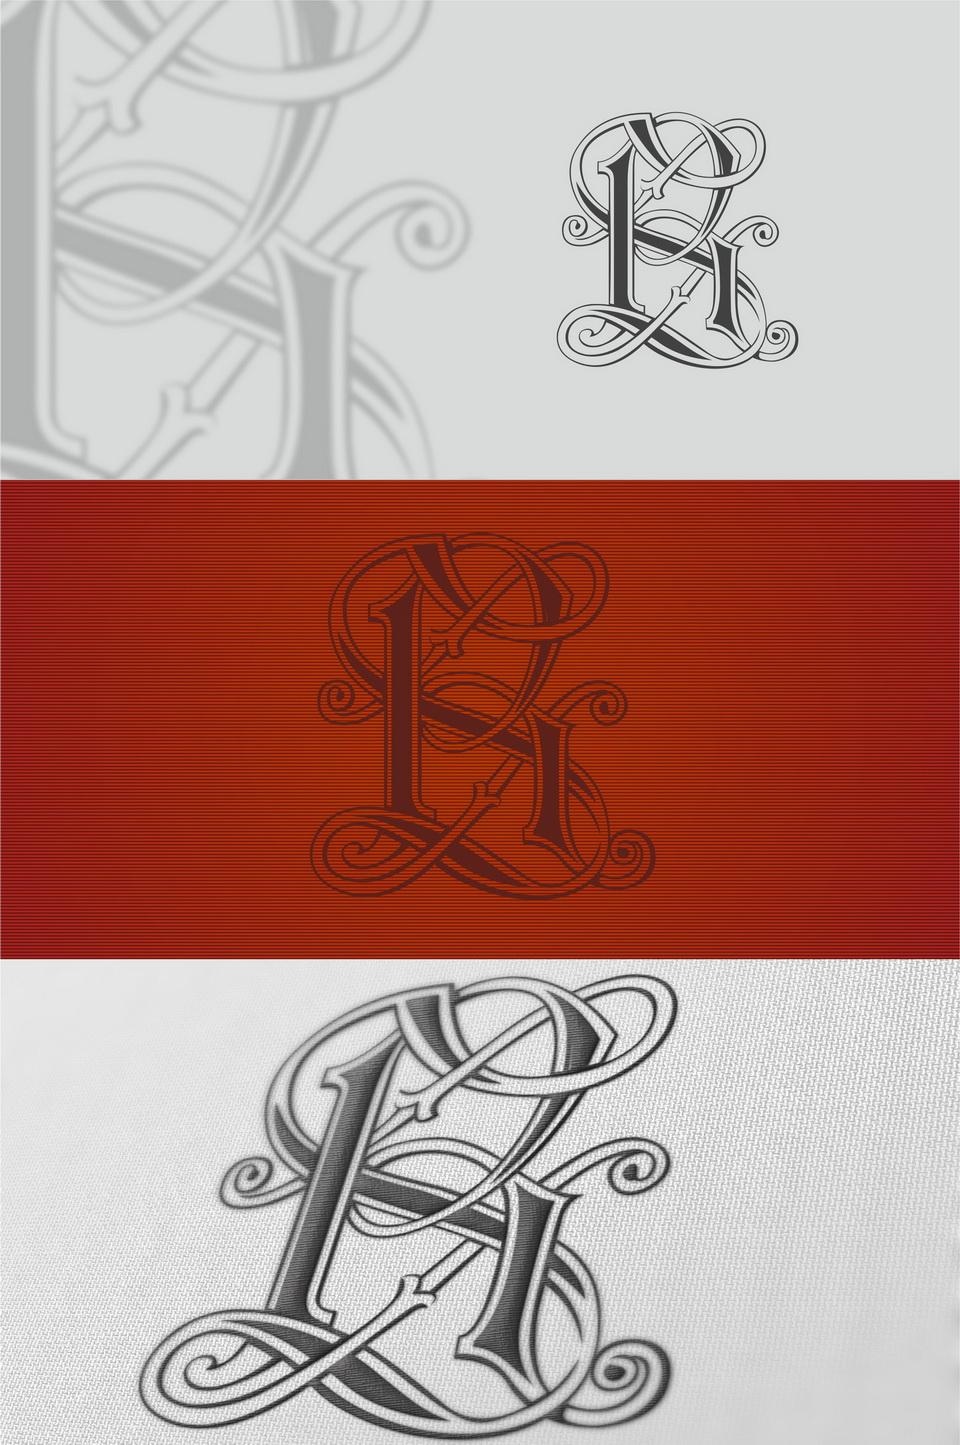 Фамильный герб RS монограмма знак логотип